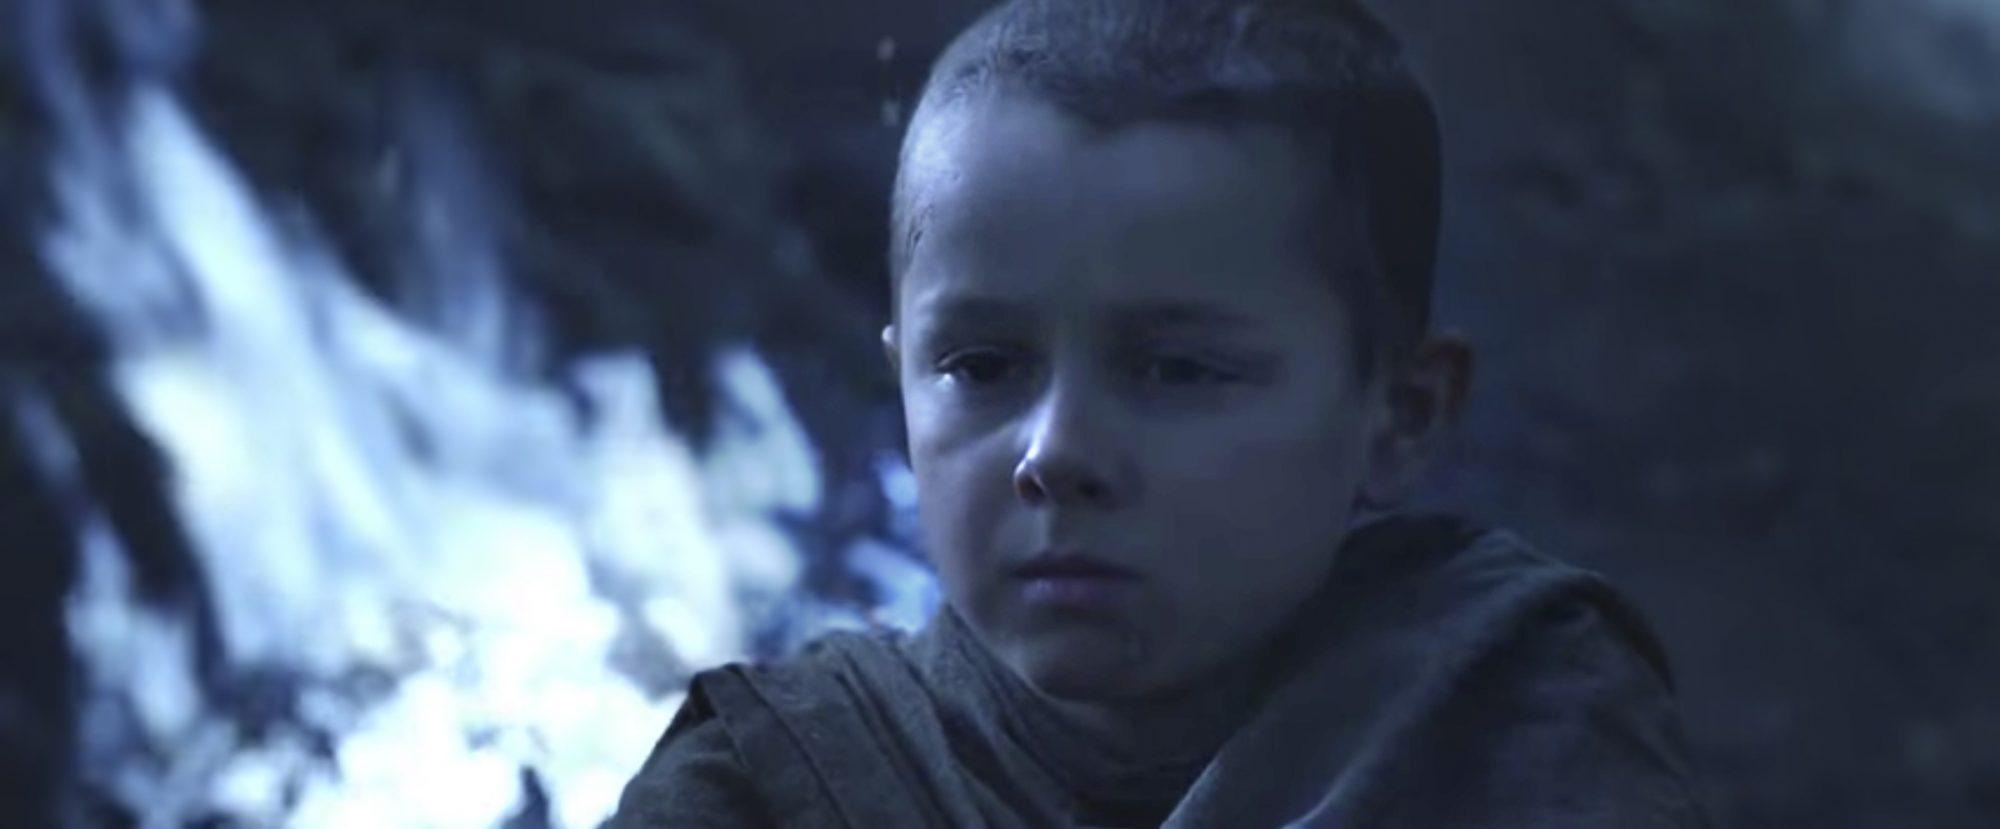 Exodus: Gods and Kings (2014) (screen grab)Isaac Andrews